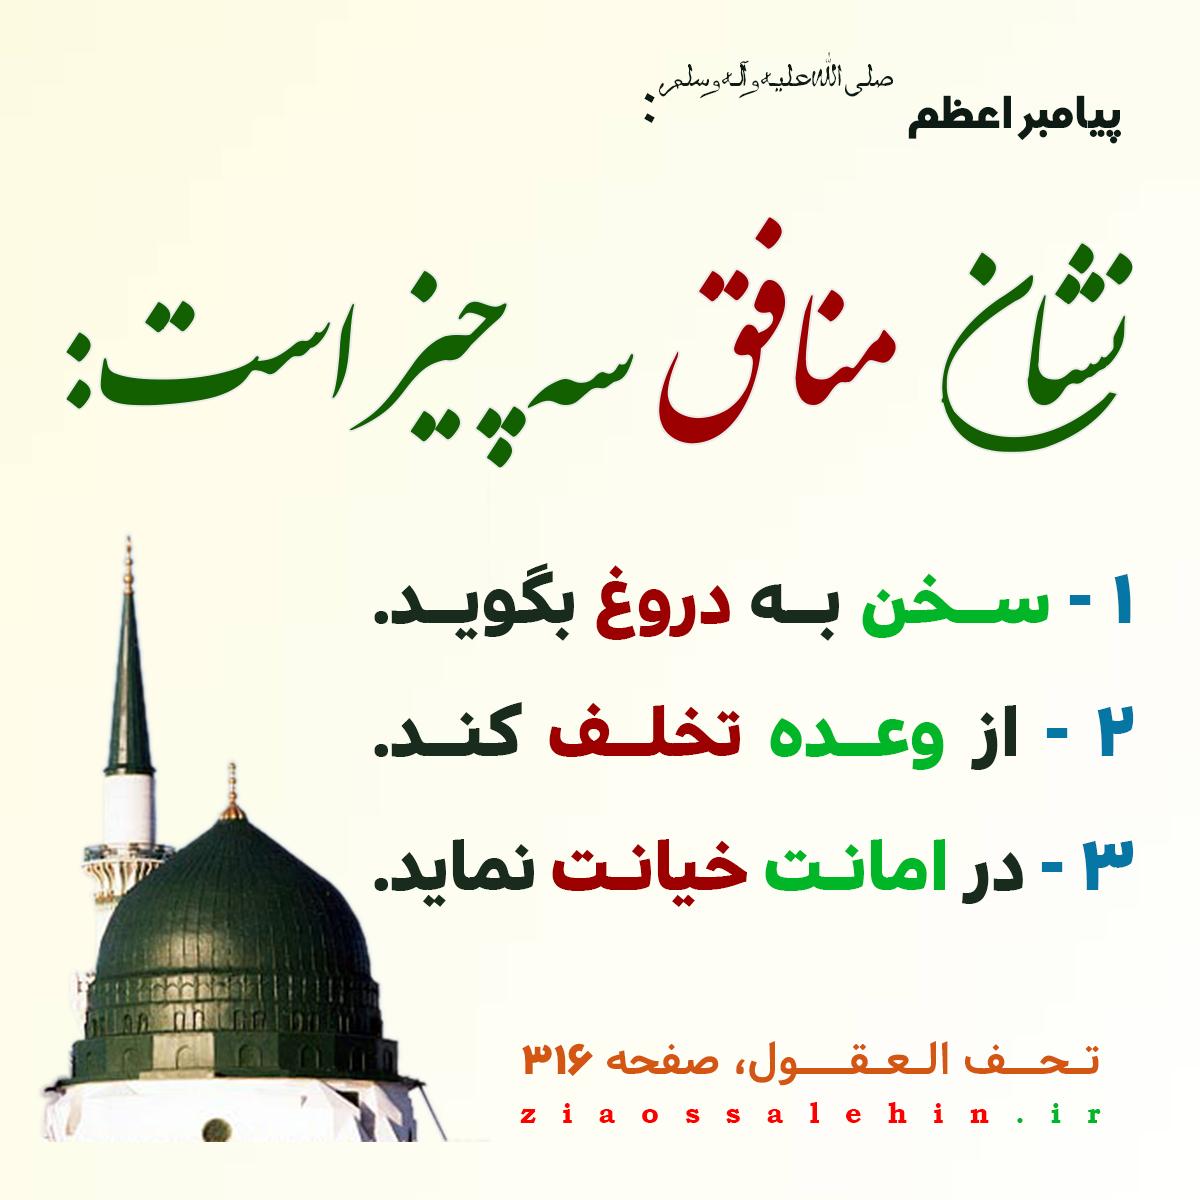 https://www.ziaossalehin.ir/sites/default/files/field/image/hazrat-mohammad_hadith001_.jpg